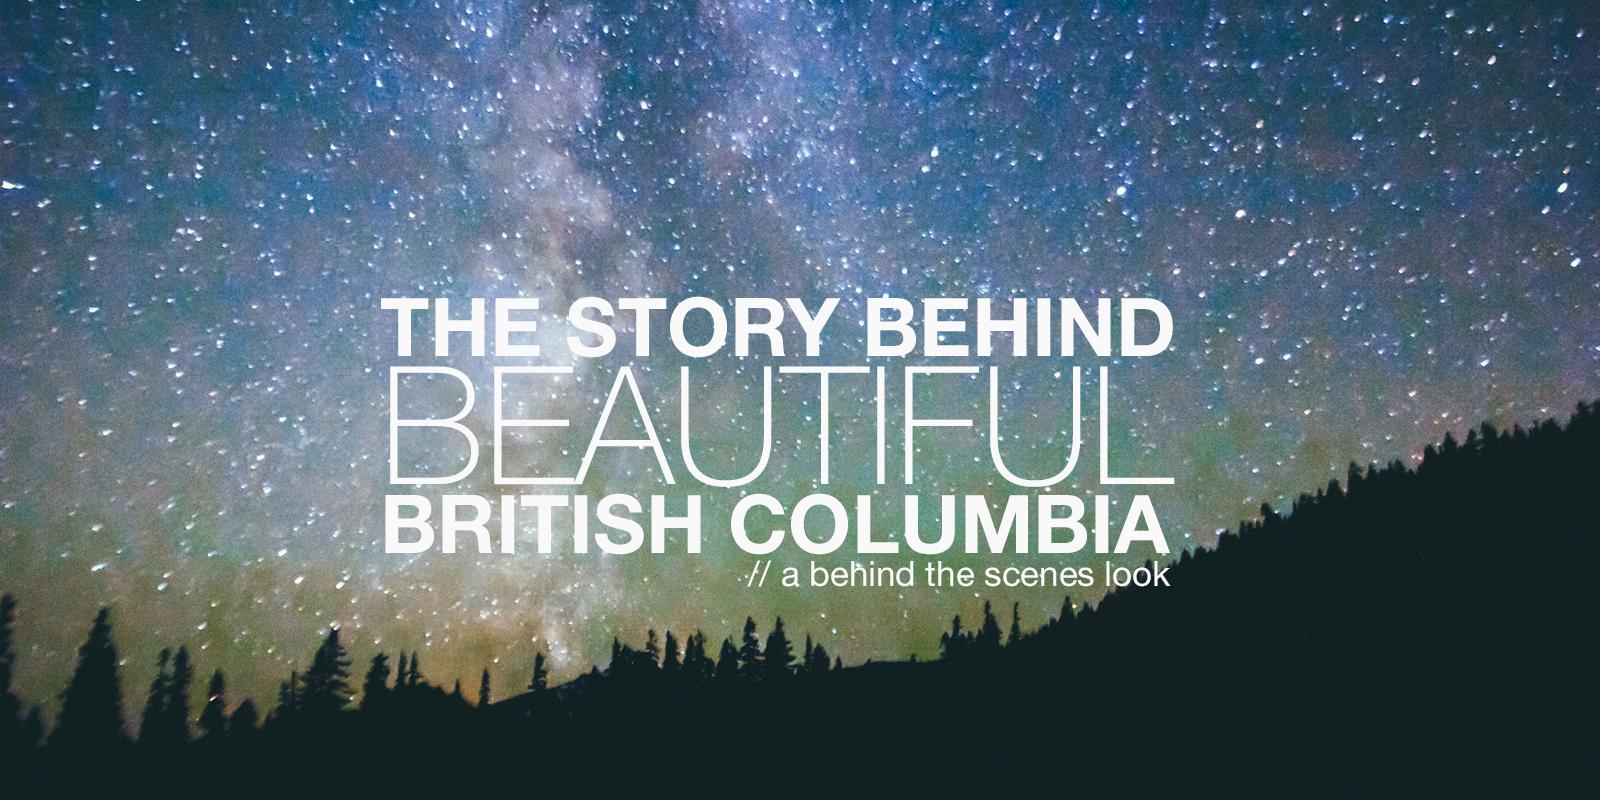 BeautifulBritishColumbia.jpg